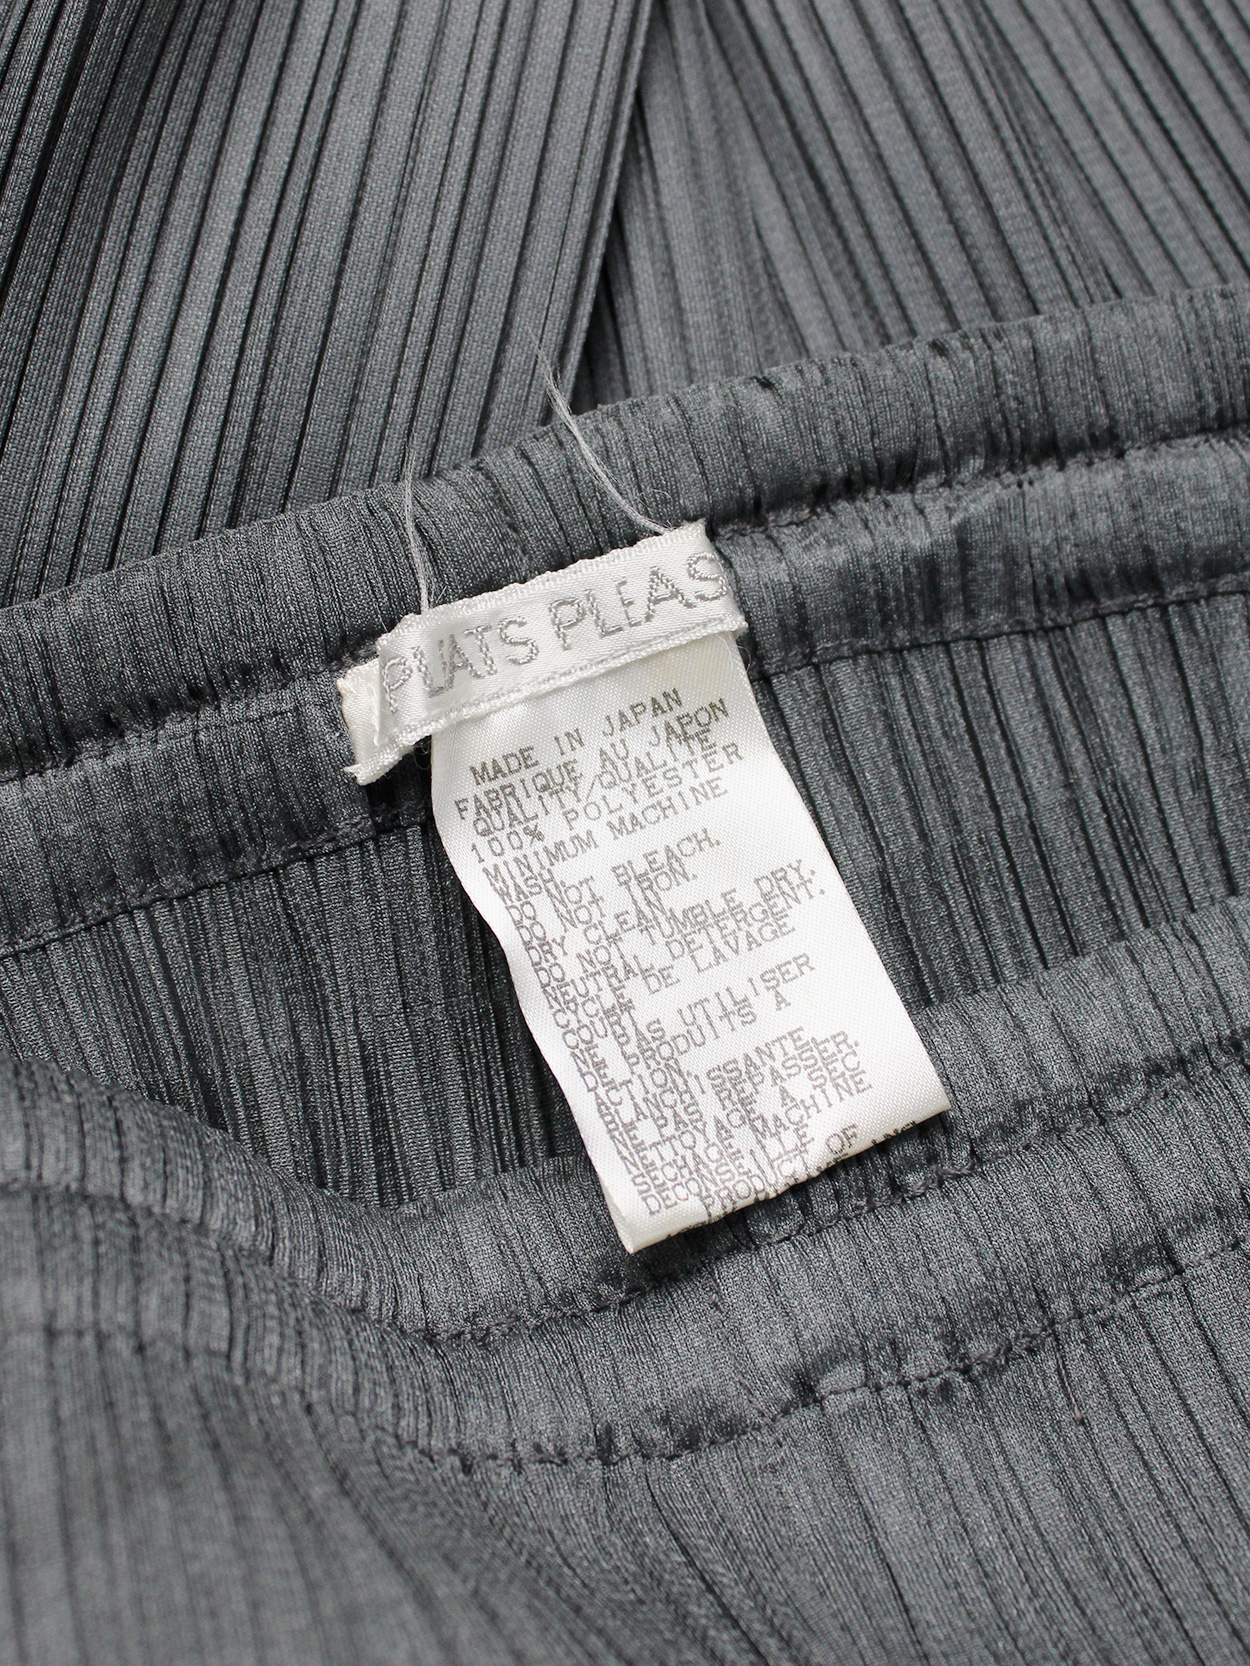 vaniitas vintage Issey Miyake Pleats Please grey trousers with fine pleats 3255